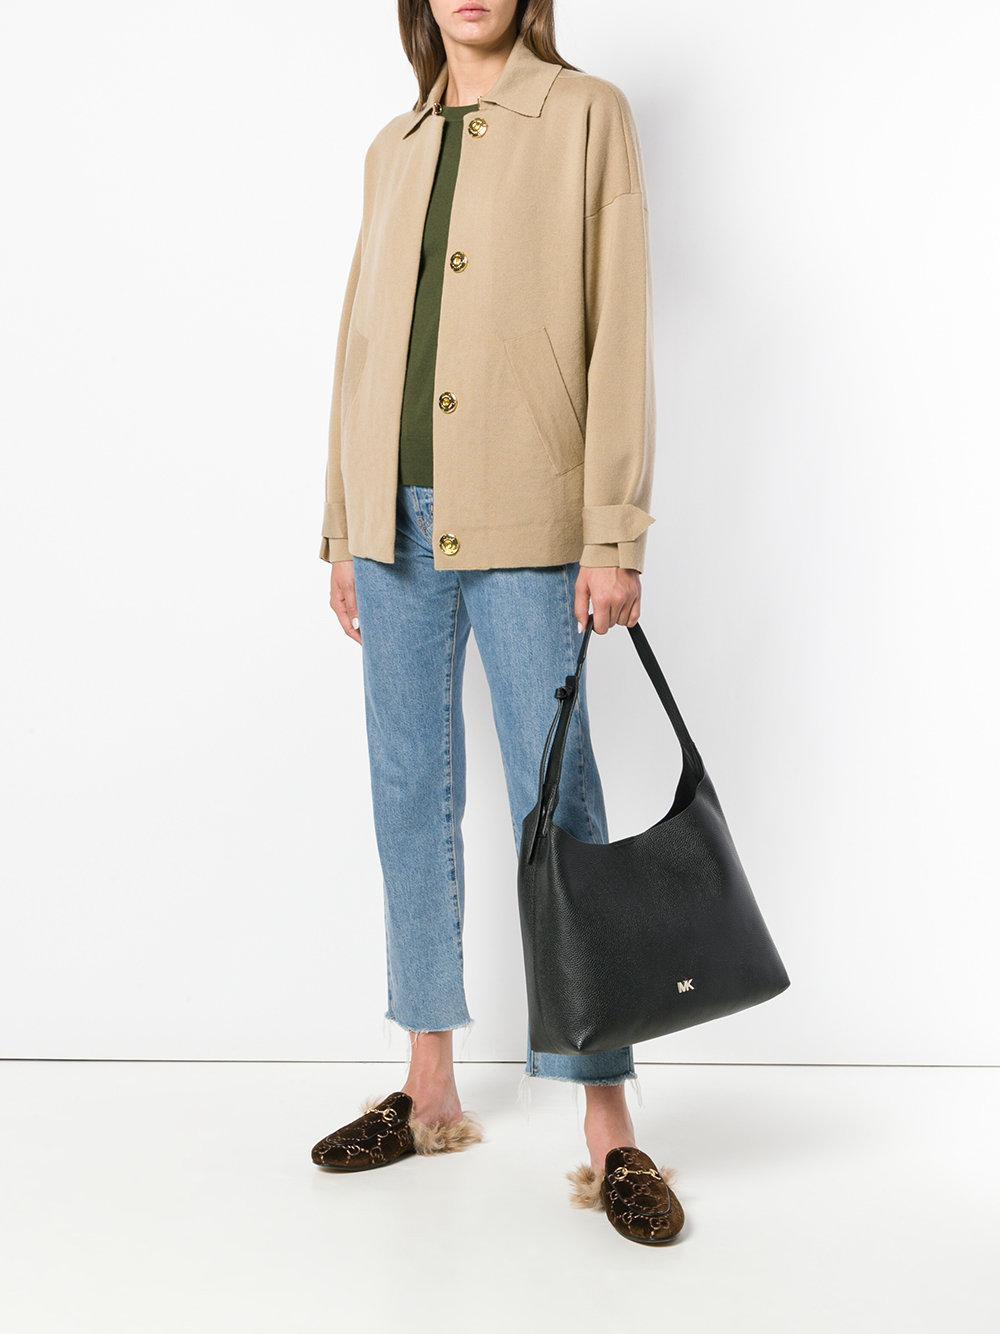 8d07e334ed58 Lyst - MICHAEL Michael Kors Classic Shoulder Bag in Black